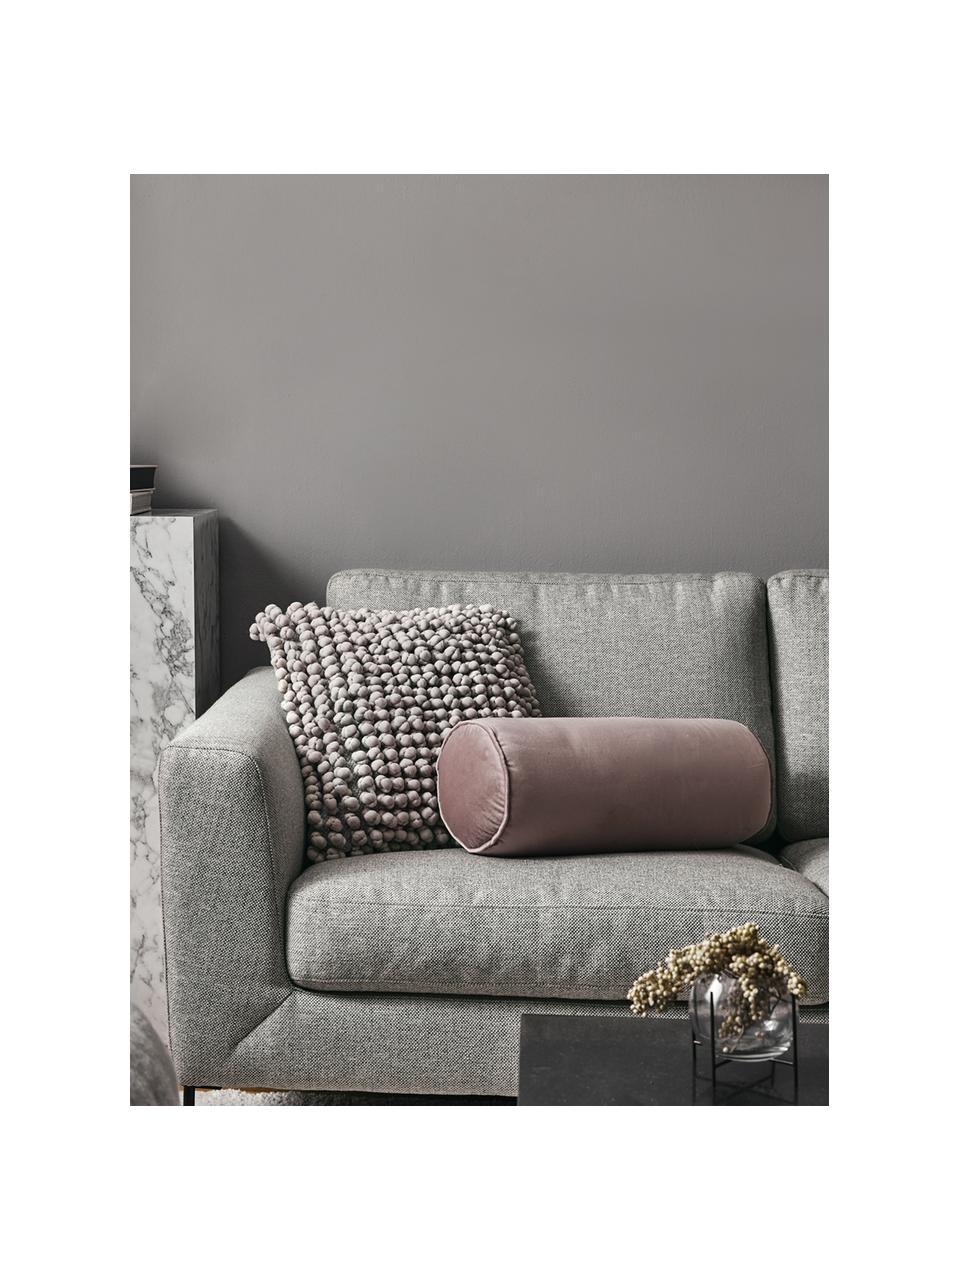 Sofa Cucita (2-Sitzer) in Hellgrau mit Metall-Füßen, Bezug: Webstoff (Polyester) Der , Gestell: Massives Kiefernholz, Füße: Metall, lackiert, Webstoff Hellgrau, B 187 x T 94 cm